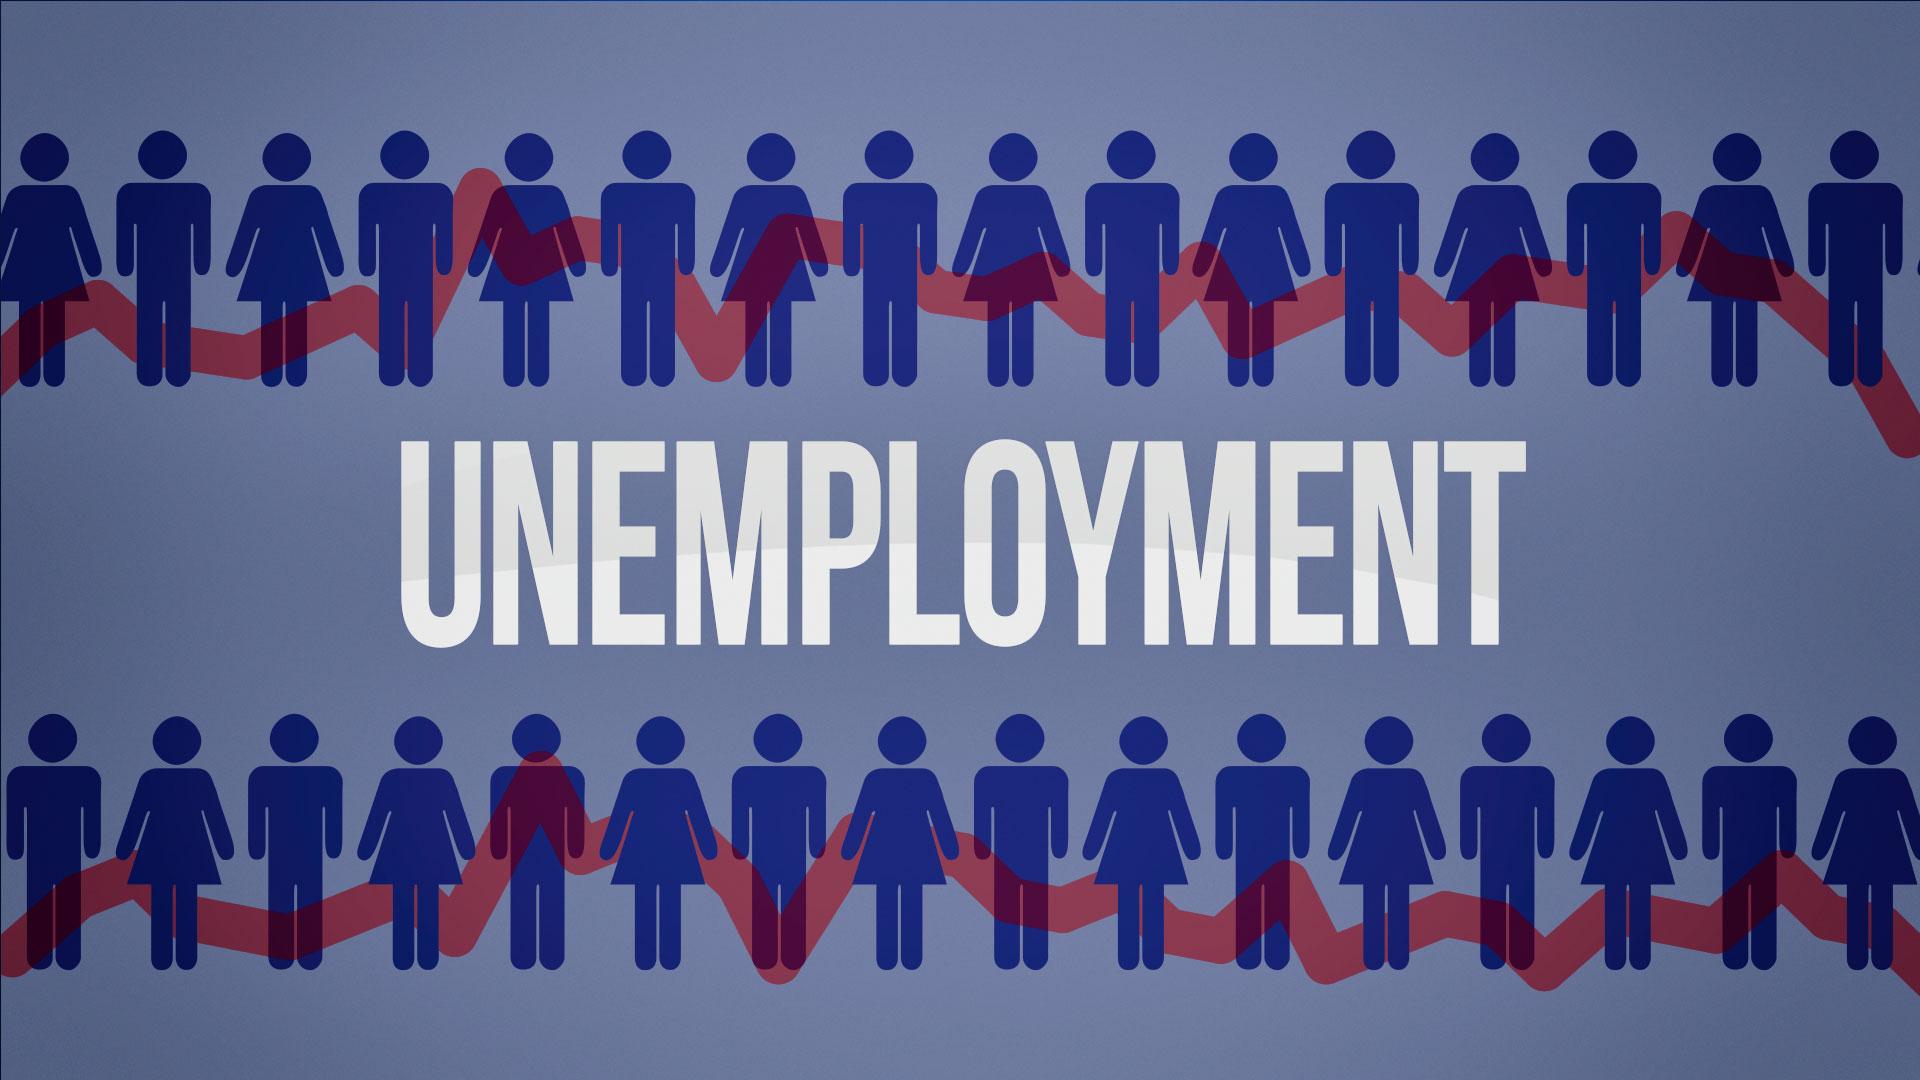 KELO Unemployment